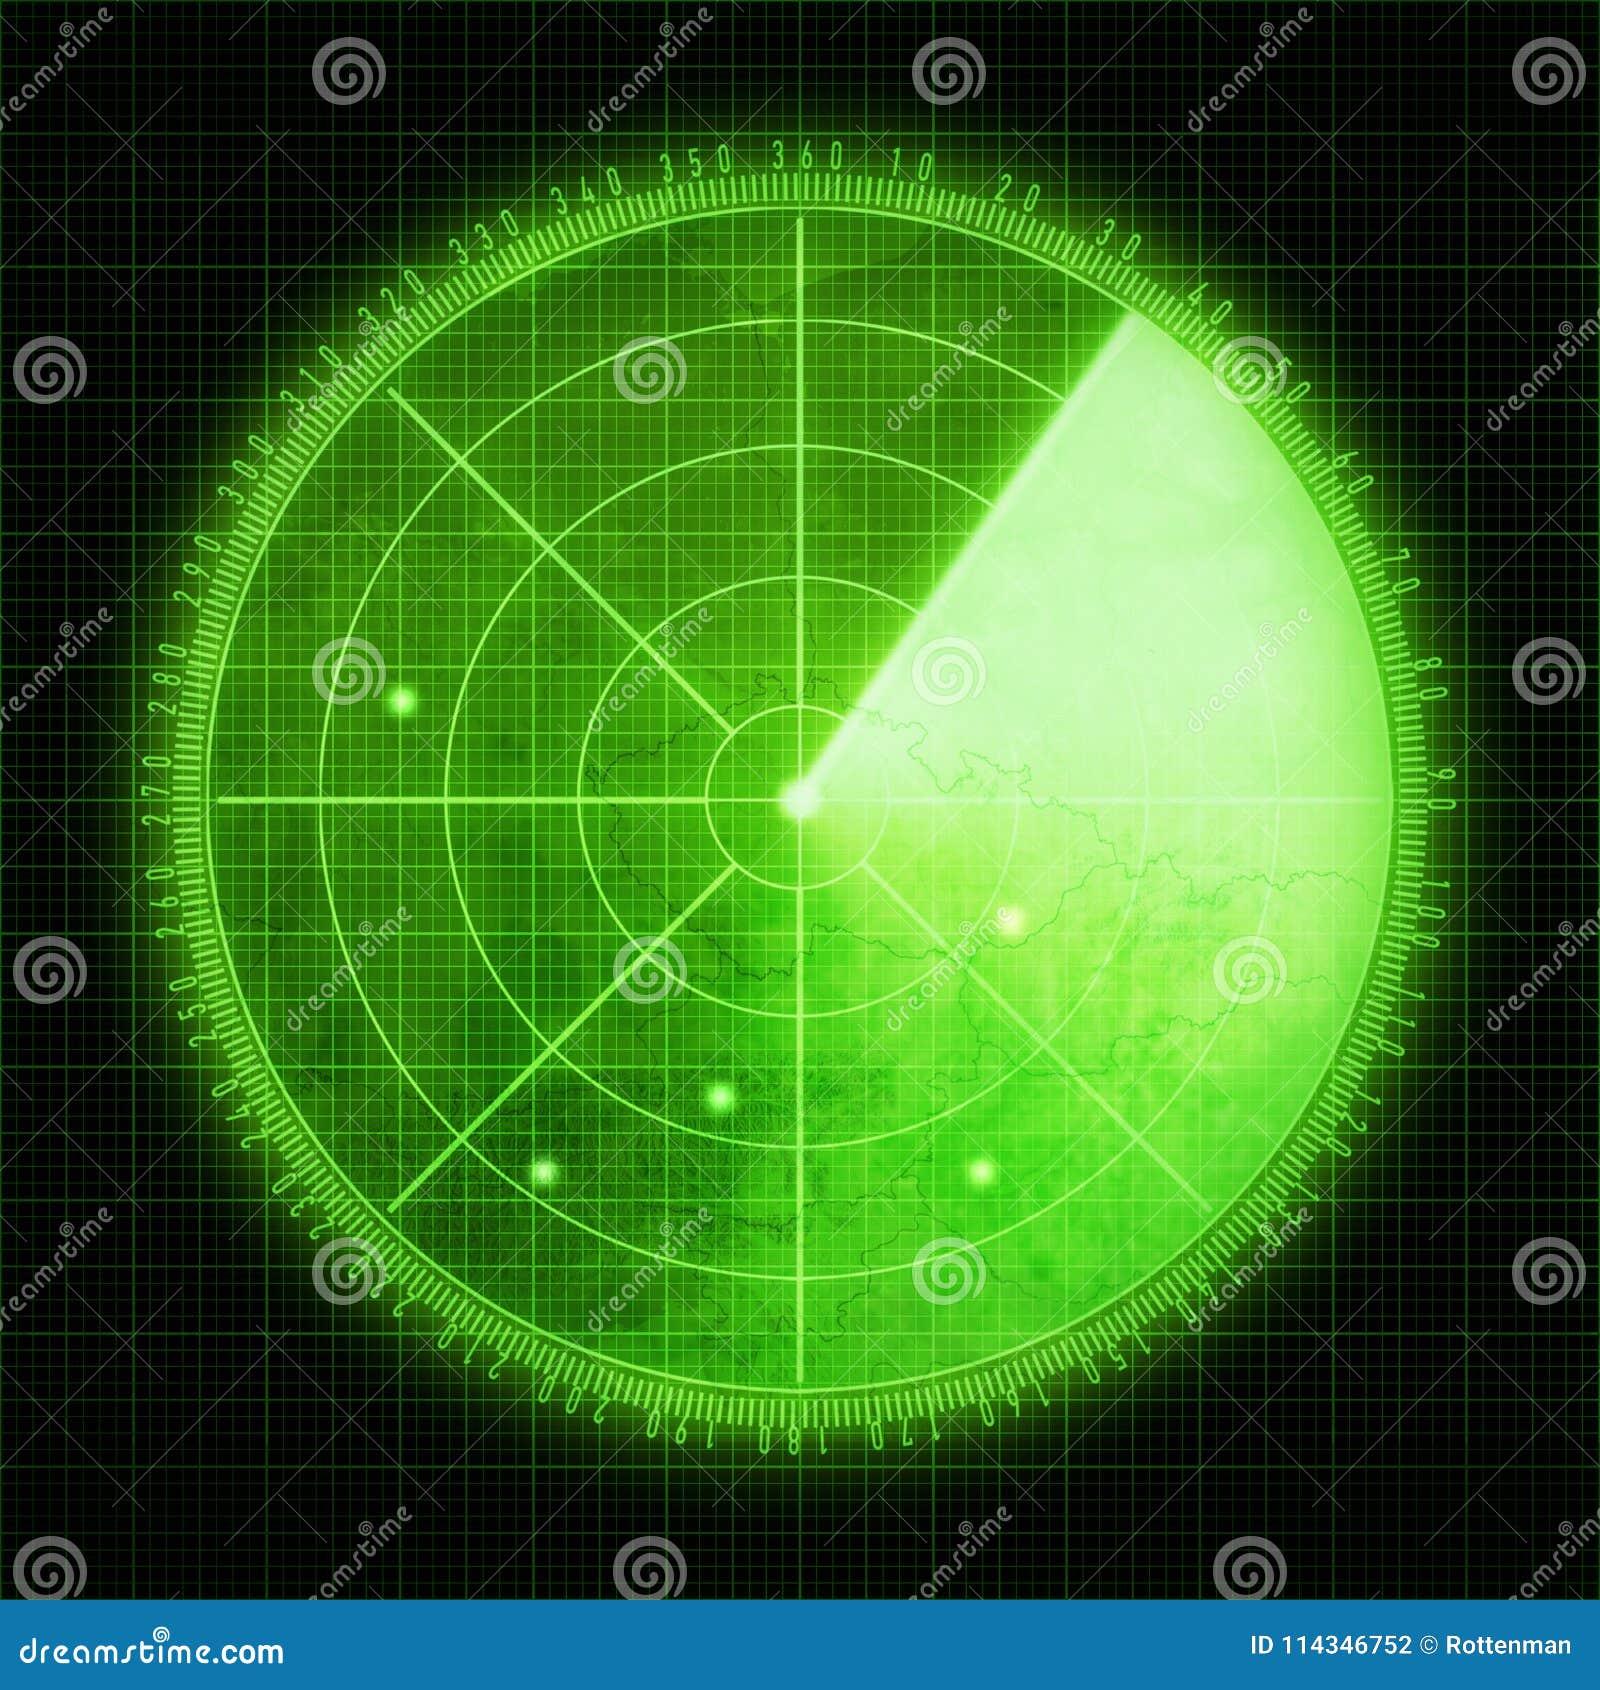 Green radar screen with targets